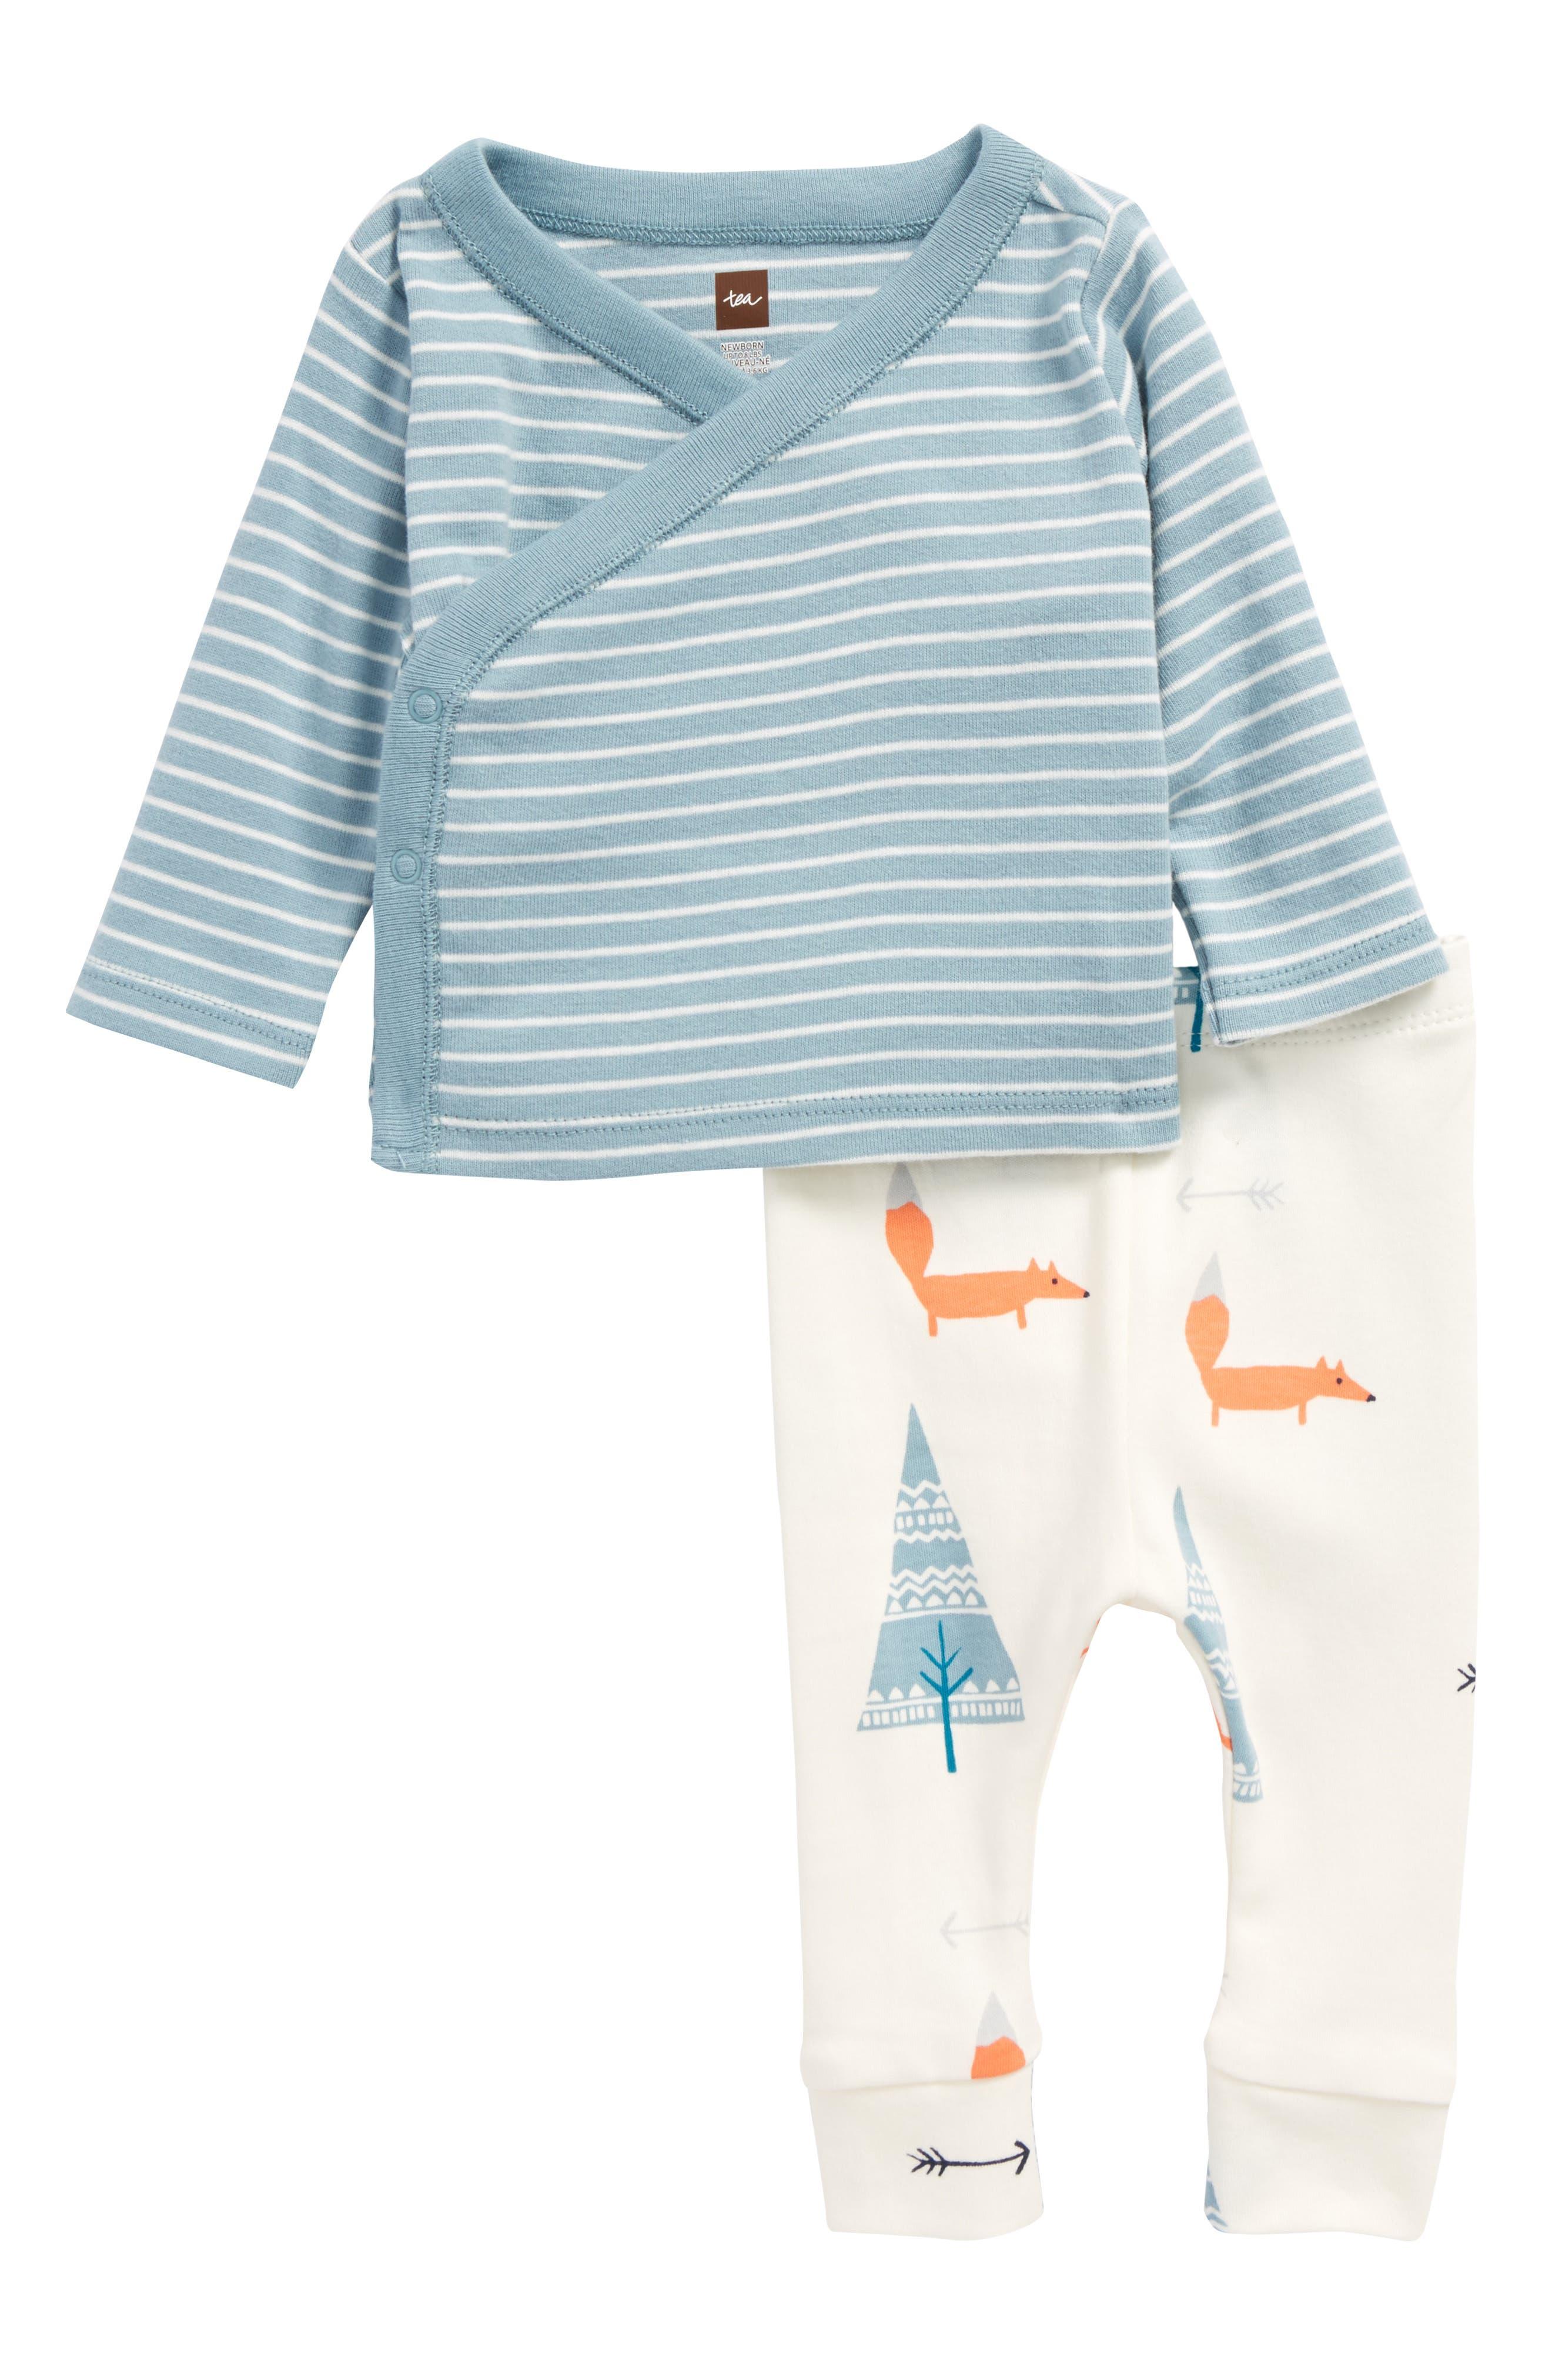 TEA COLLECTION,                             Wrap Tunic & Pants Set,                             Main thumbnail 1, color,                             466